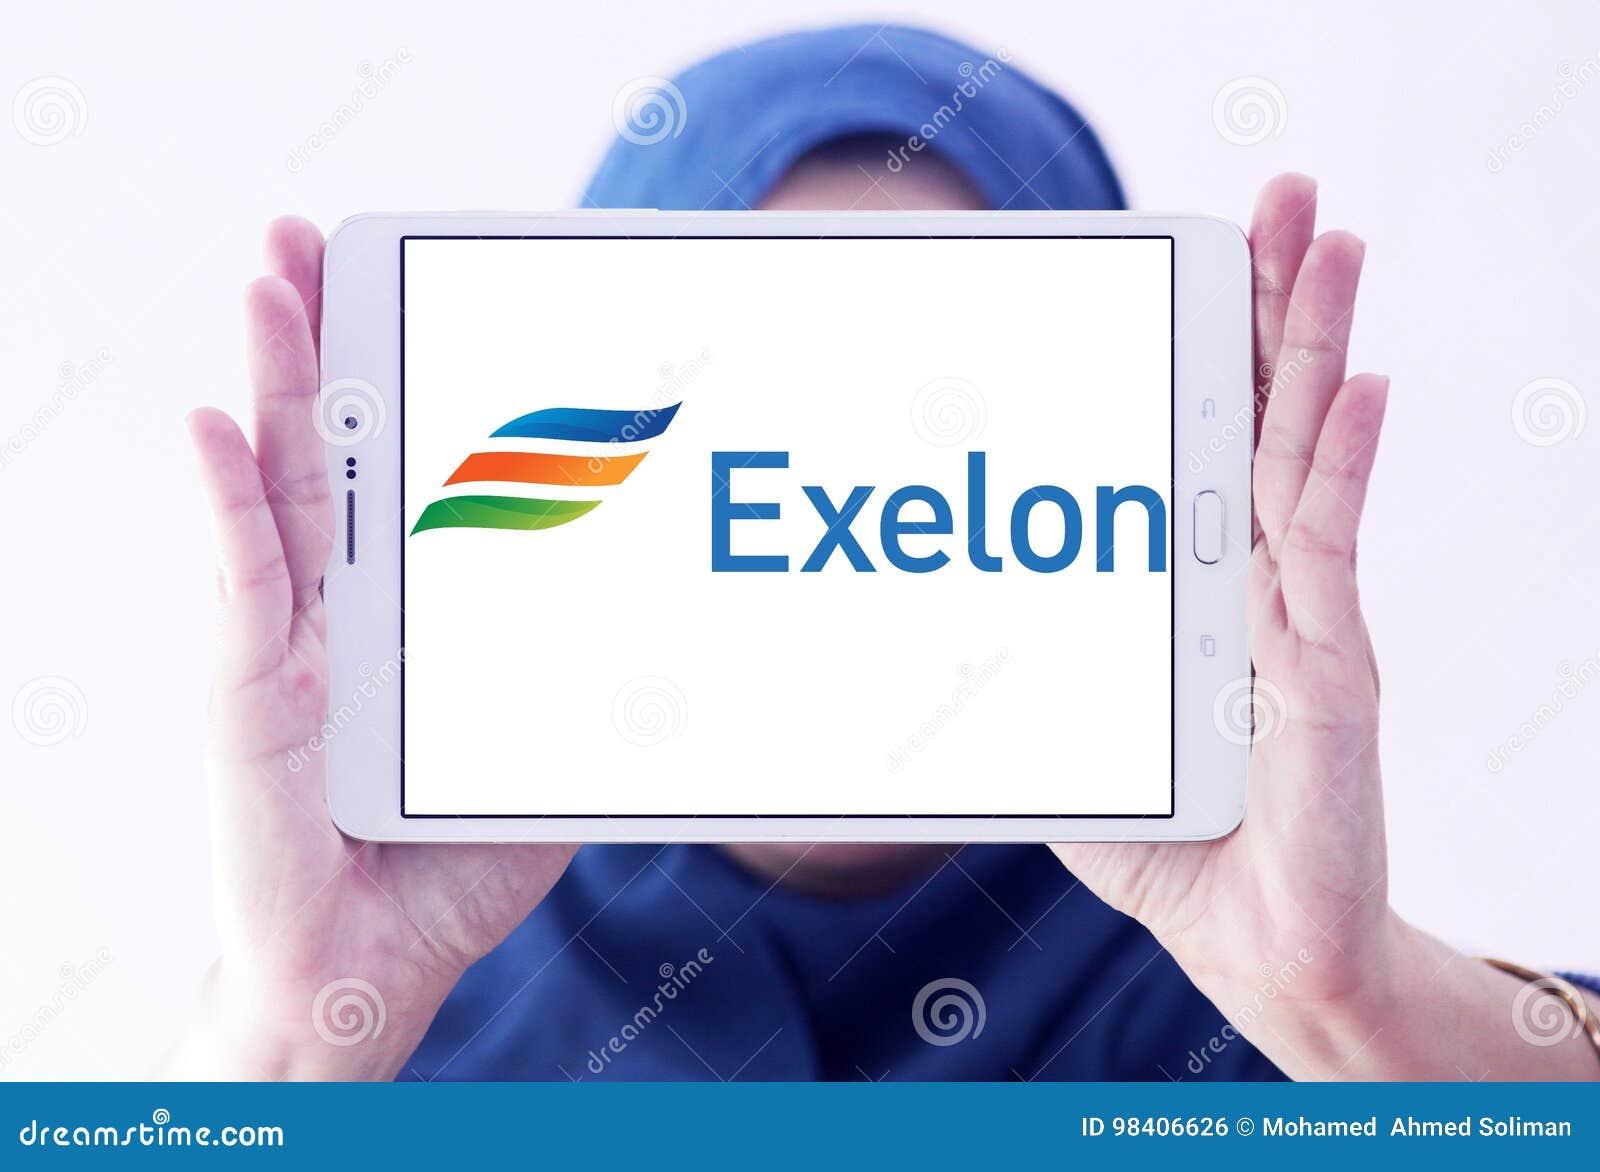 Exelon Energy Company Logo Editorial Photo Image Of Brand 98406626